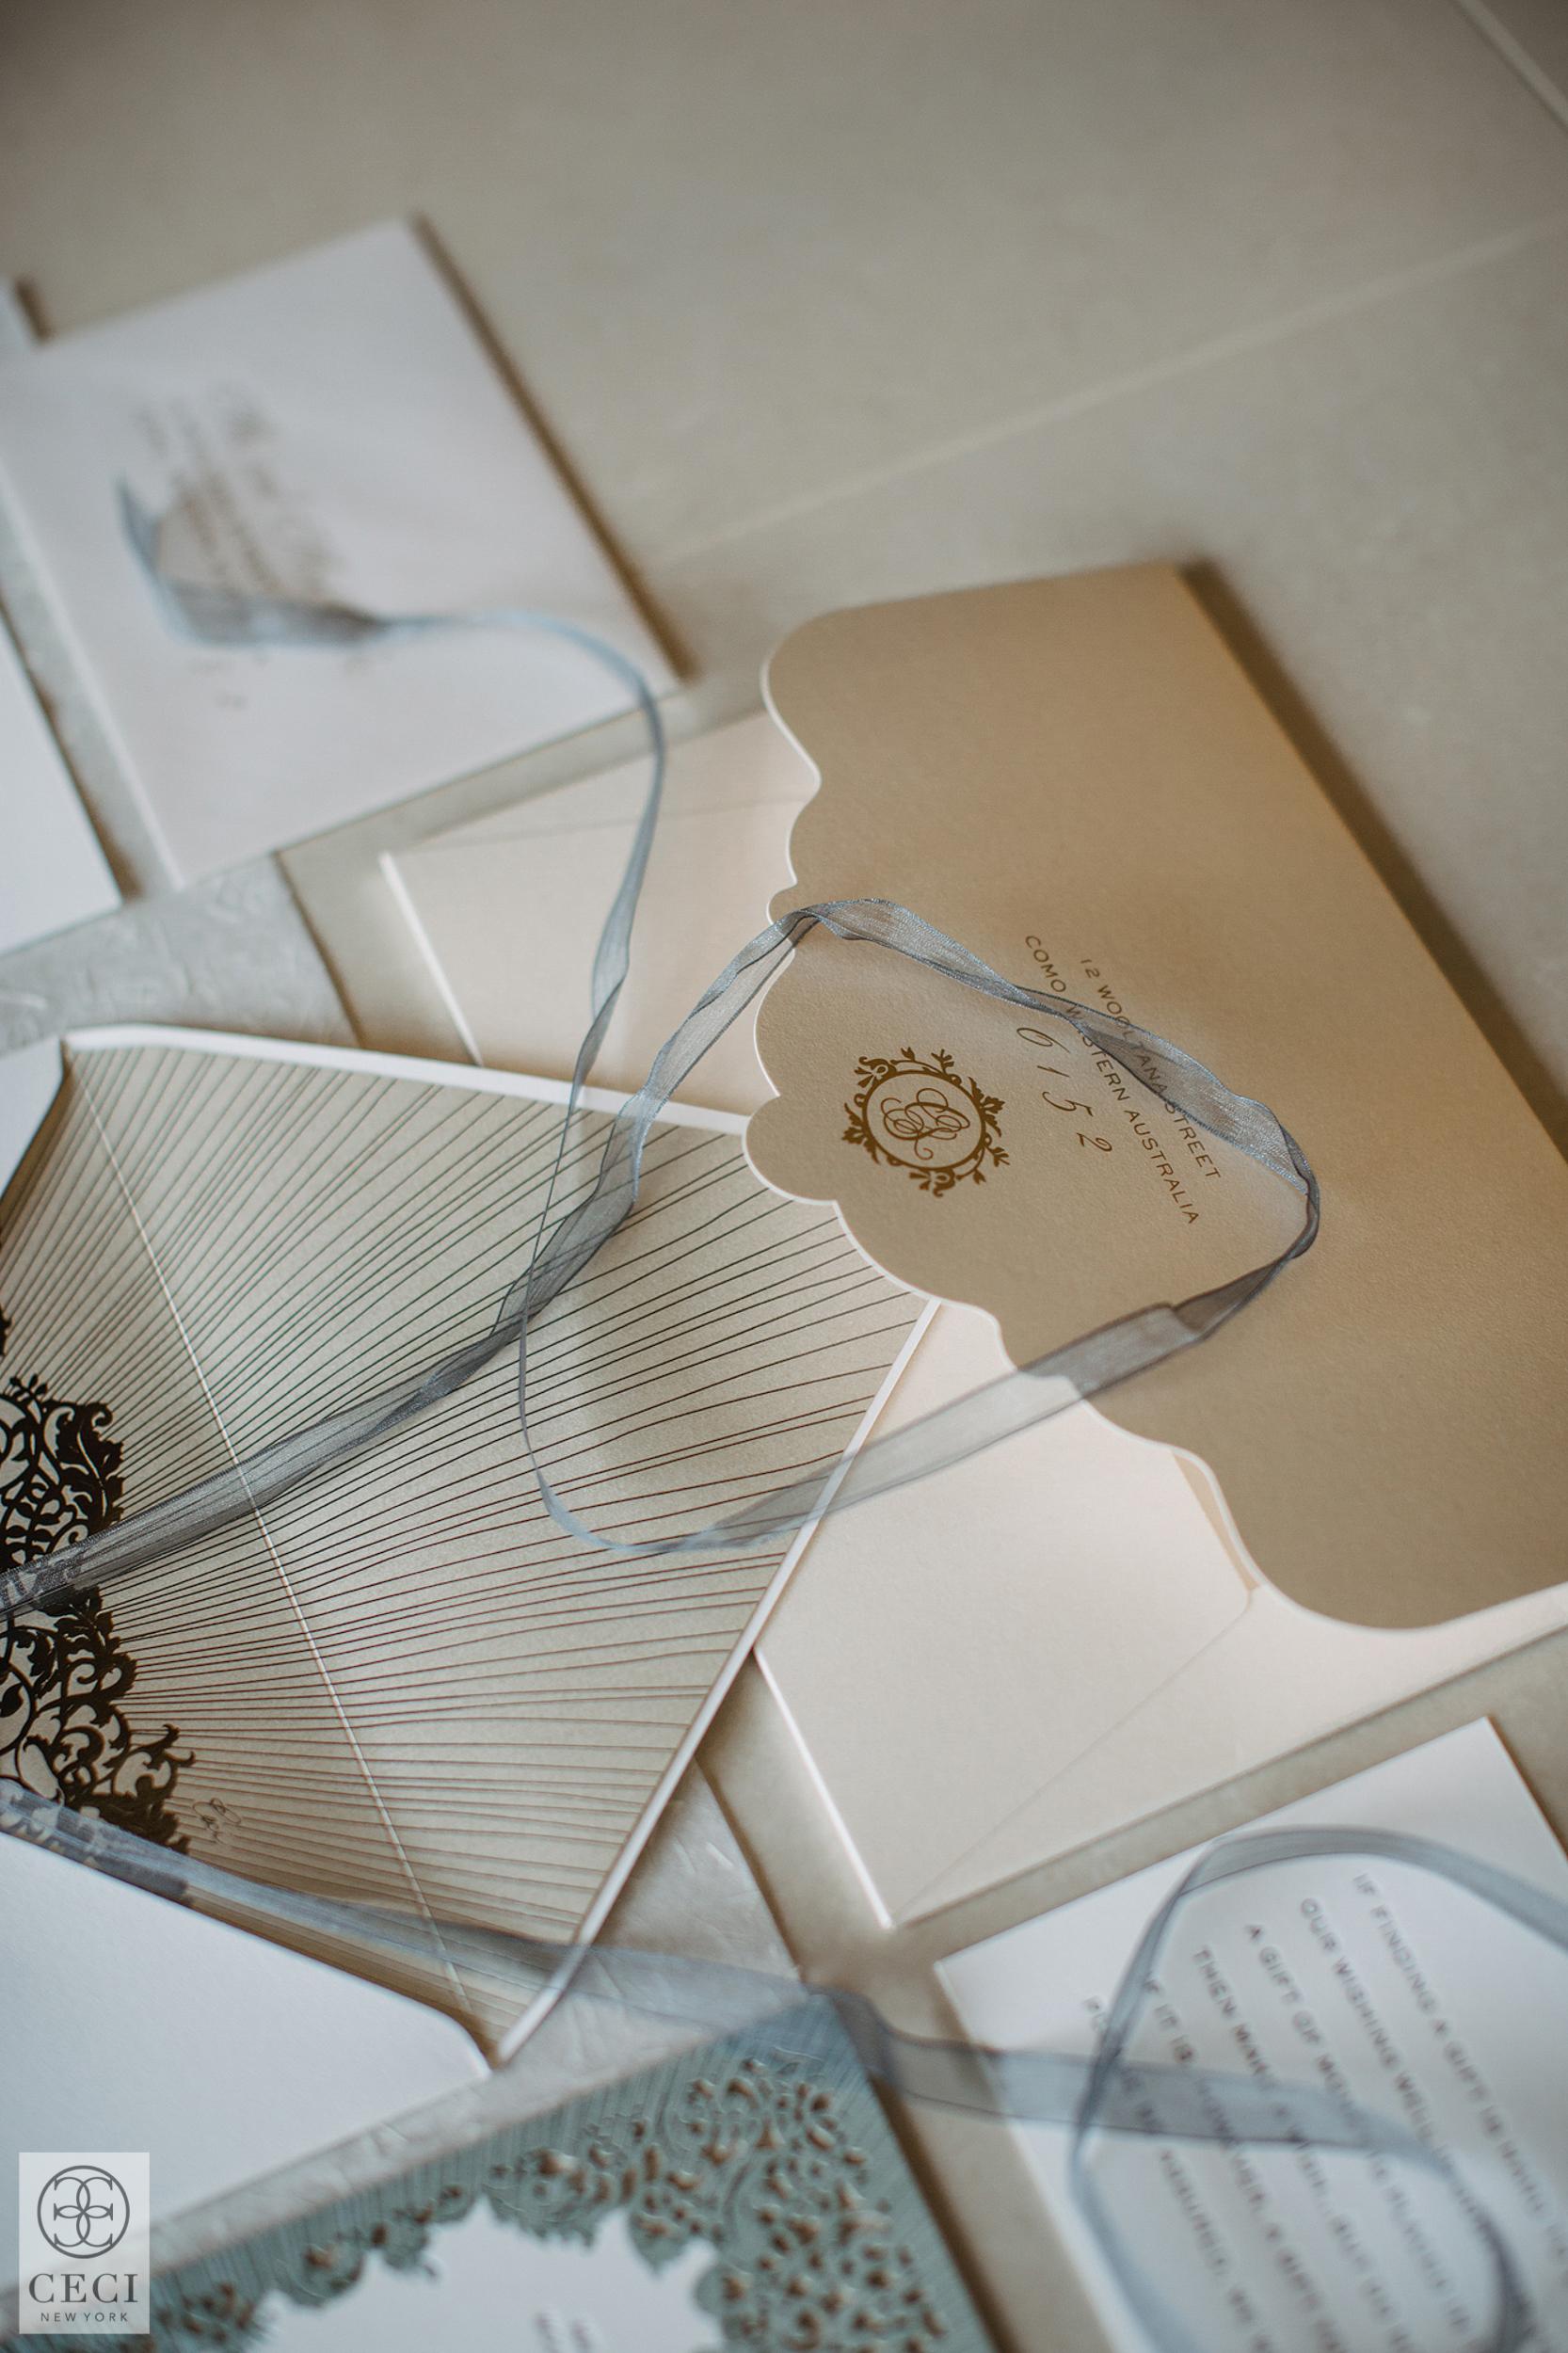 Ceci_New_York_Custom_Luxury_Wedding_BeautyShot_LaserCut_Stationery_Personalized_Couture_Foil_Stamping_Perth_Destination_Australia_Chic_-5.jpg